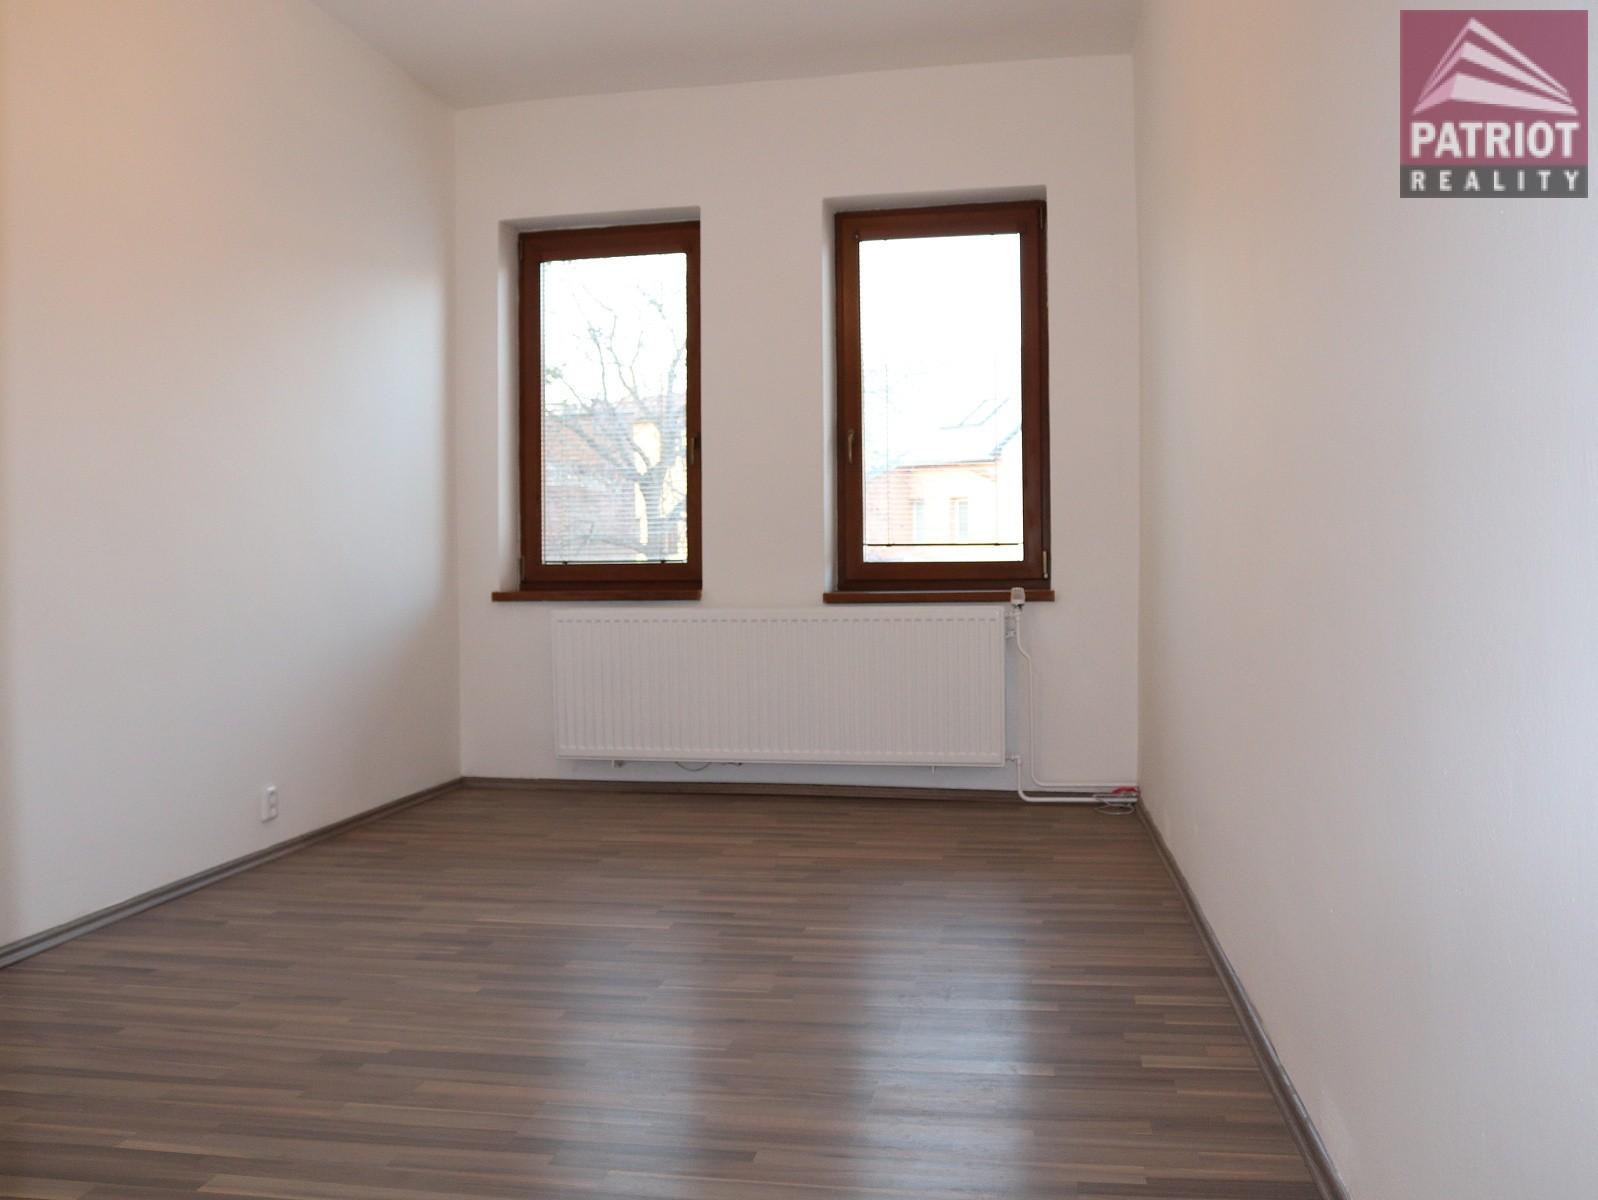 Mezonetový byt 5+1 Rejskova v Olomouci   PRODÁNO - 6